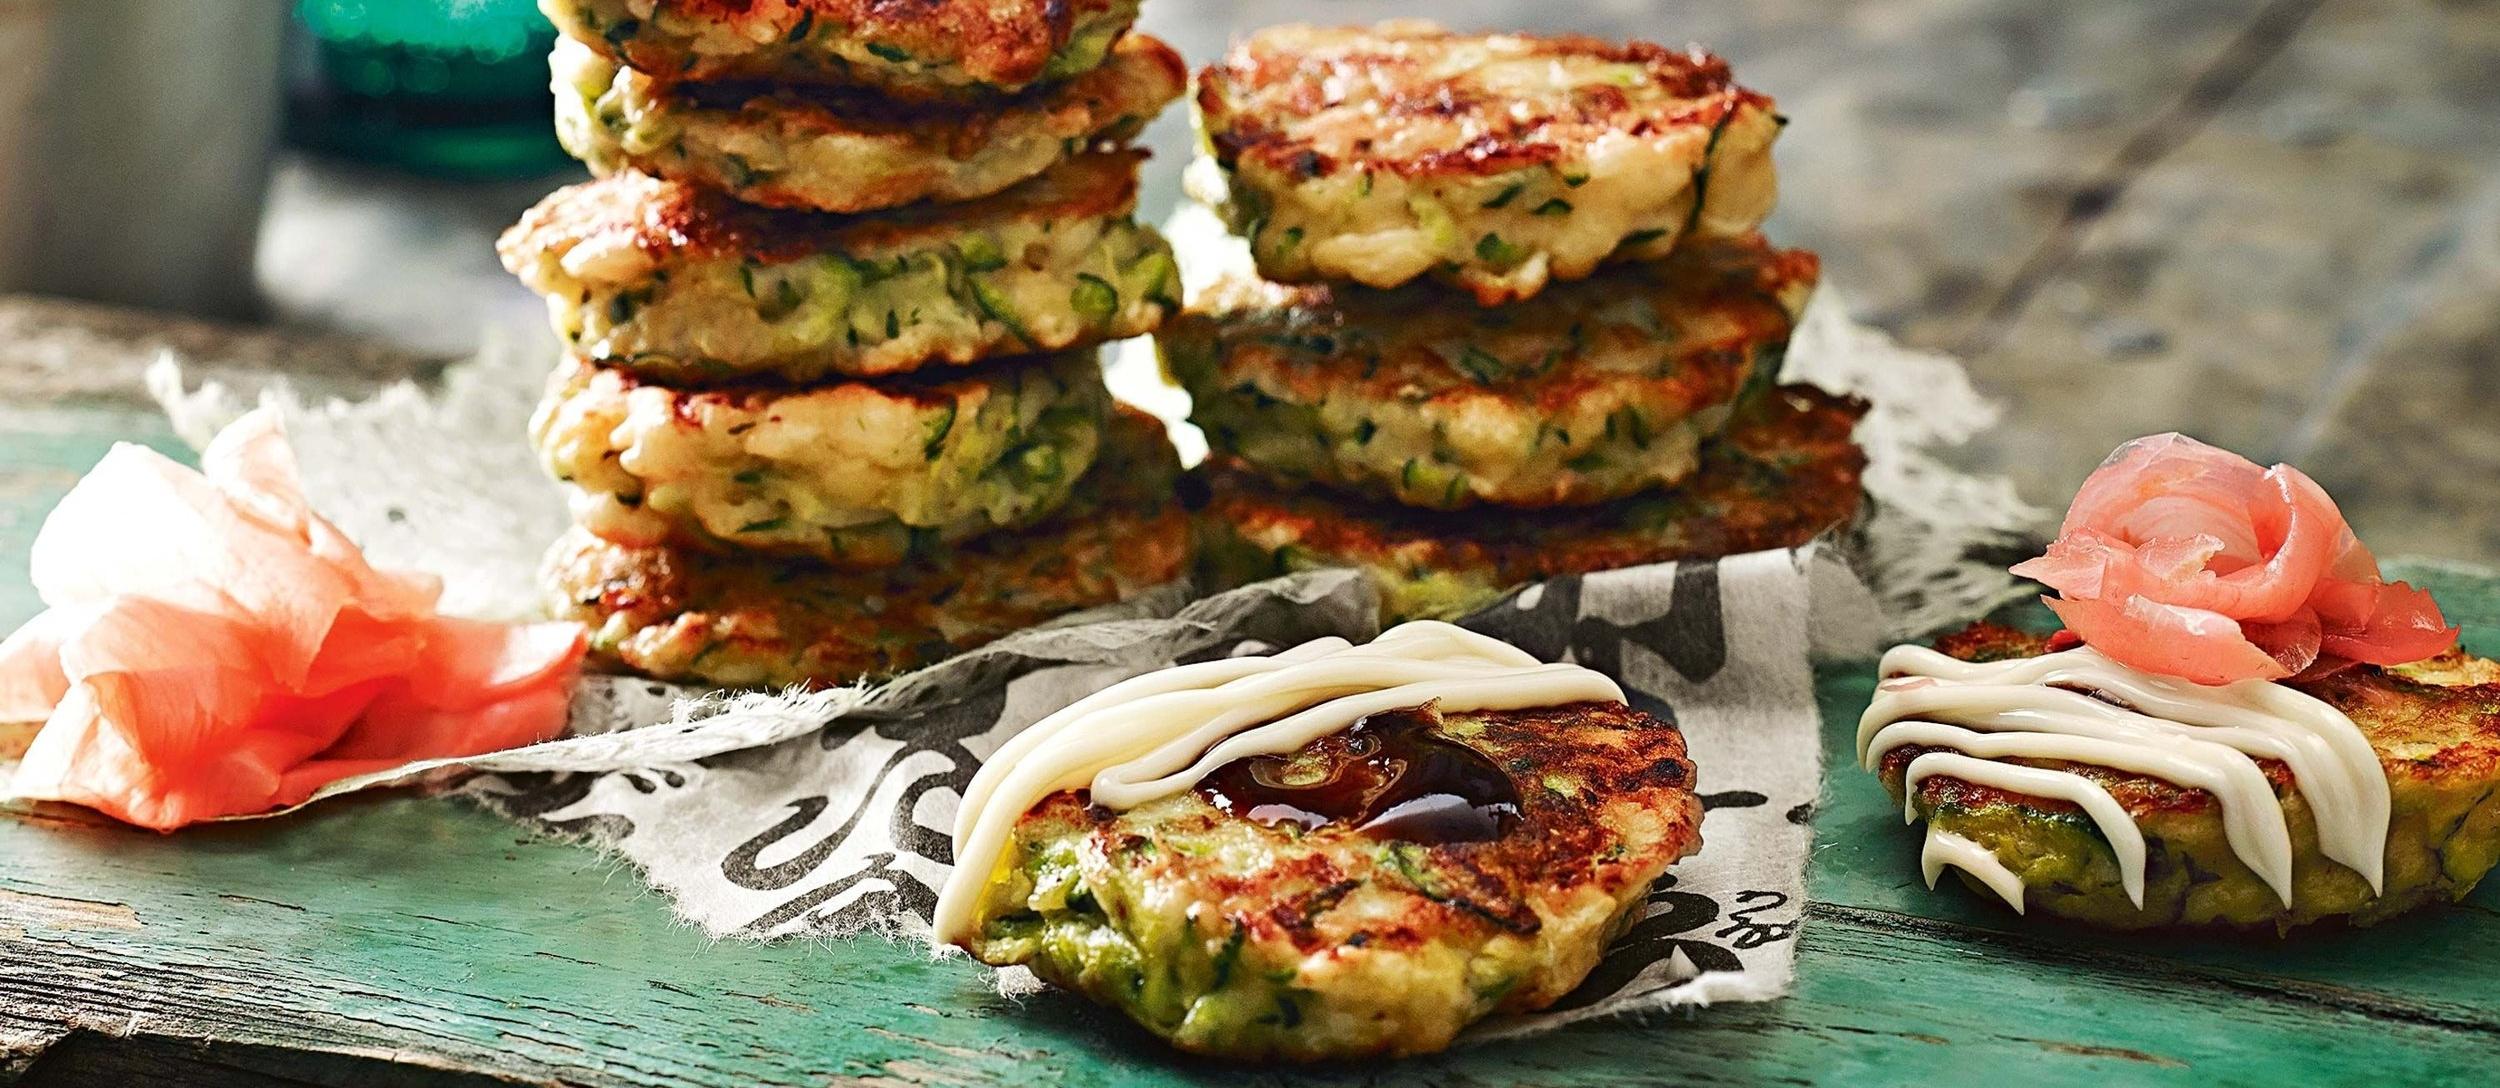 mini-okonomiyaki-japanese-pancakes-100216-1.jpeg